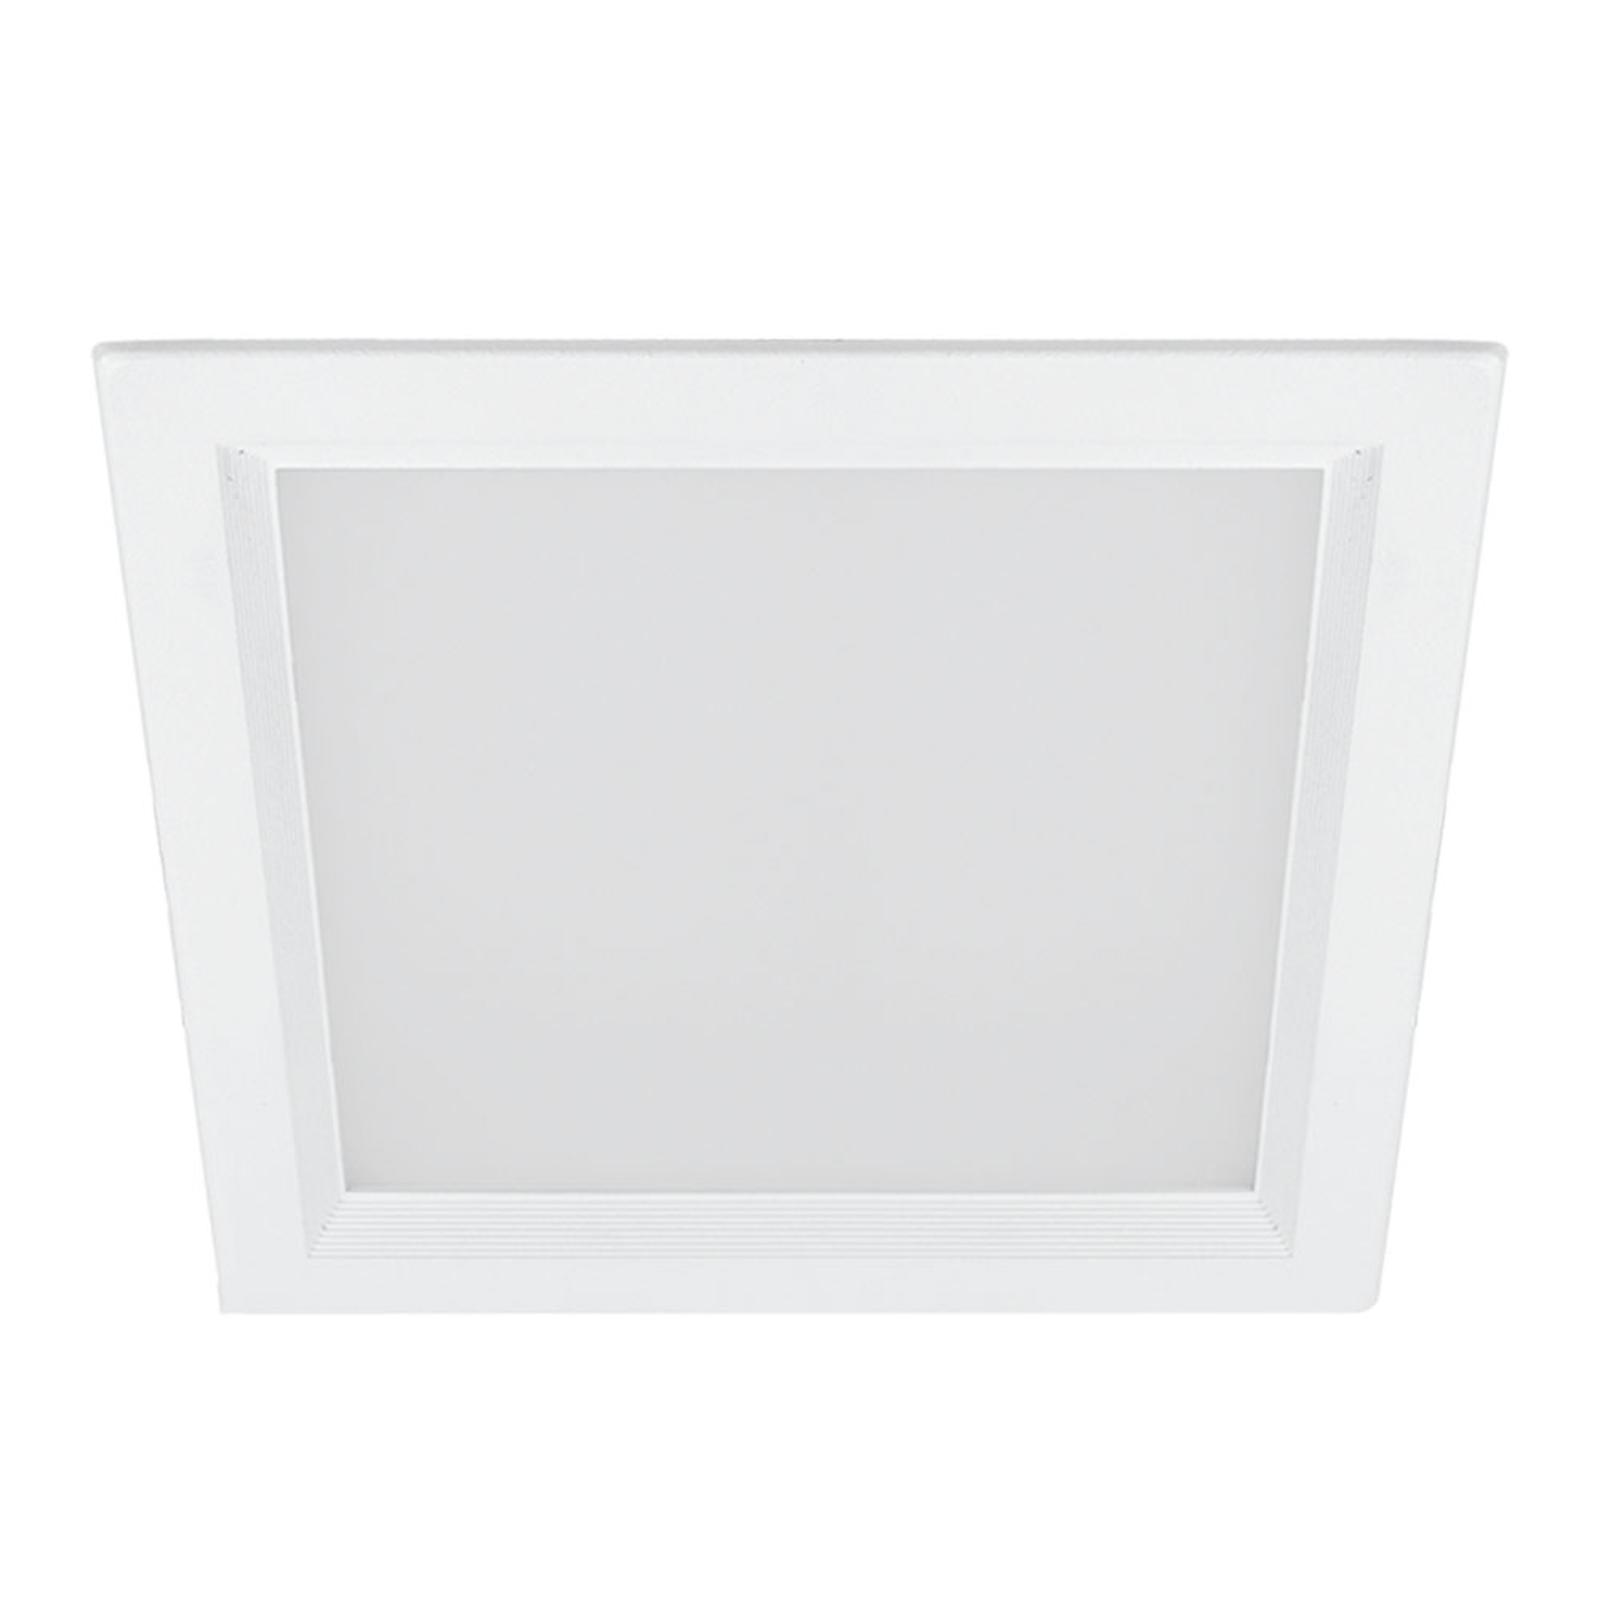 LED-Einbauleuchte scota-SDES-O/120 4.000K 12x12cm